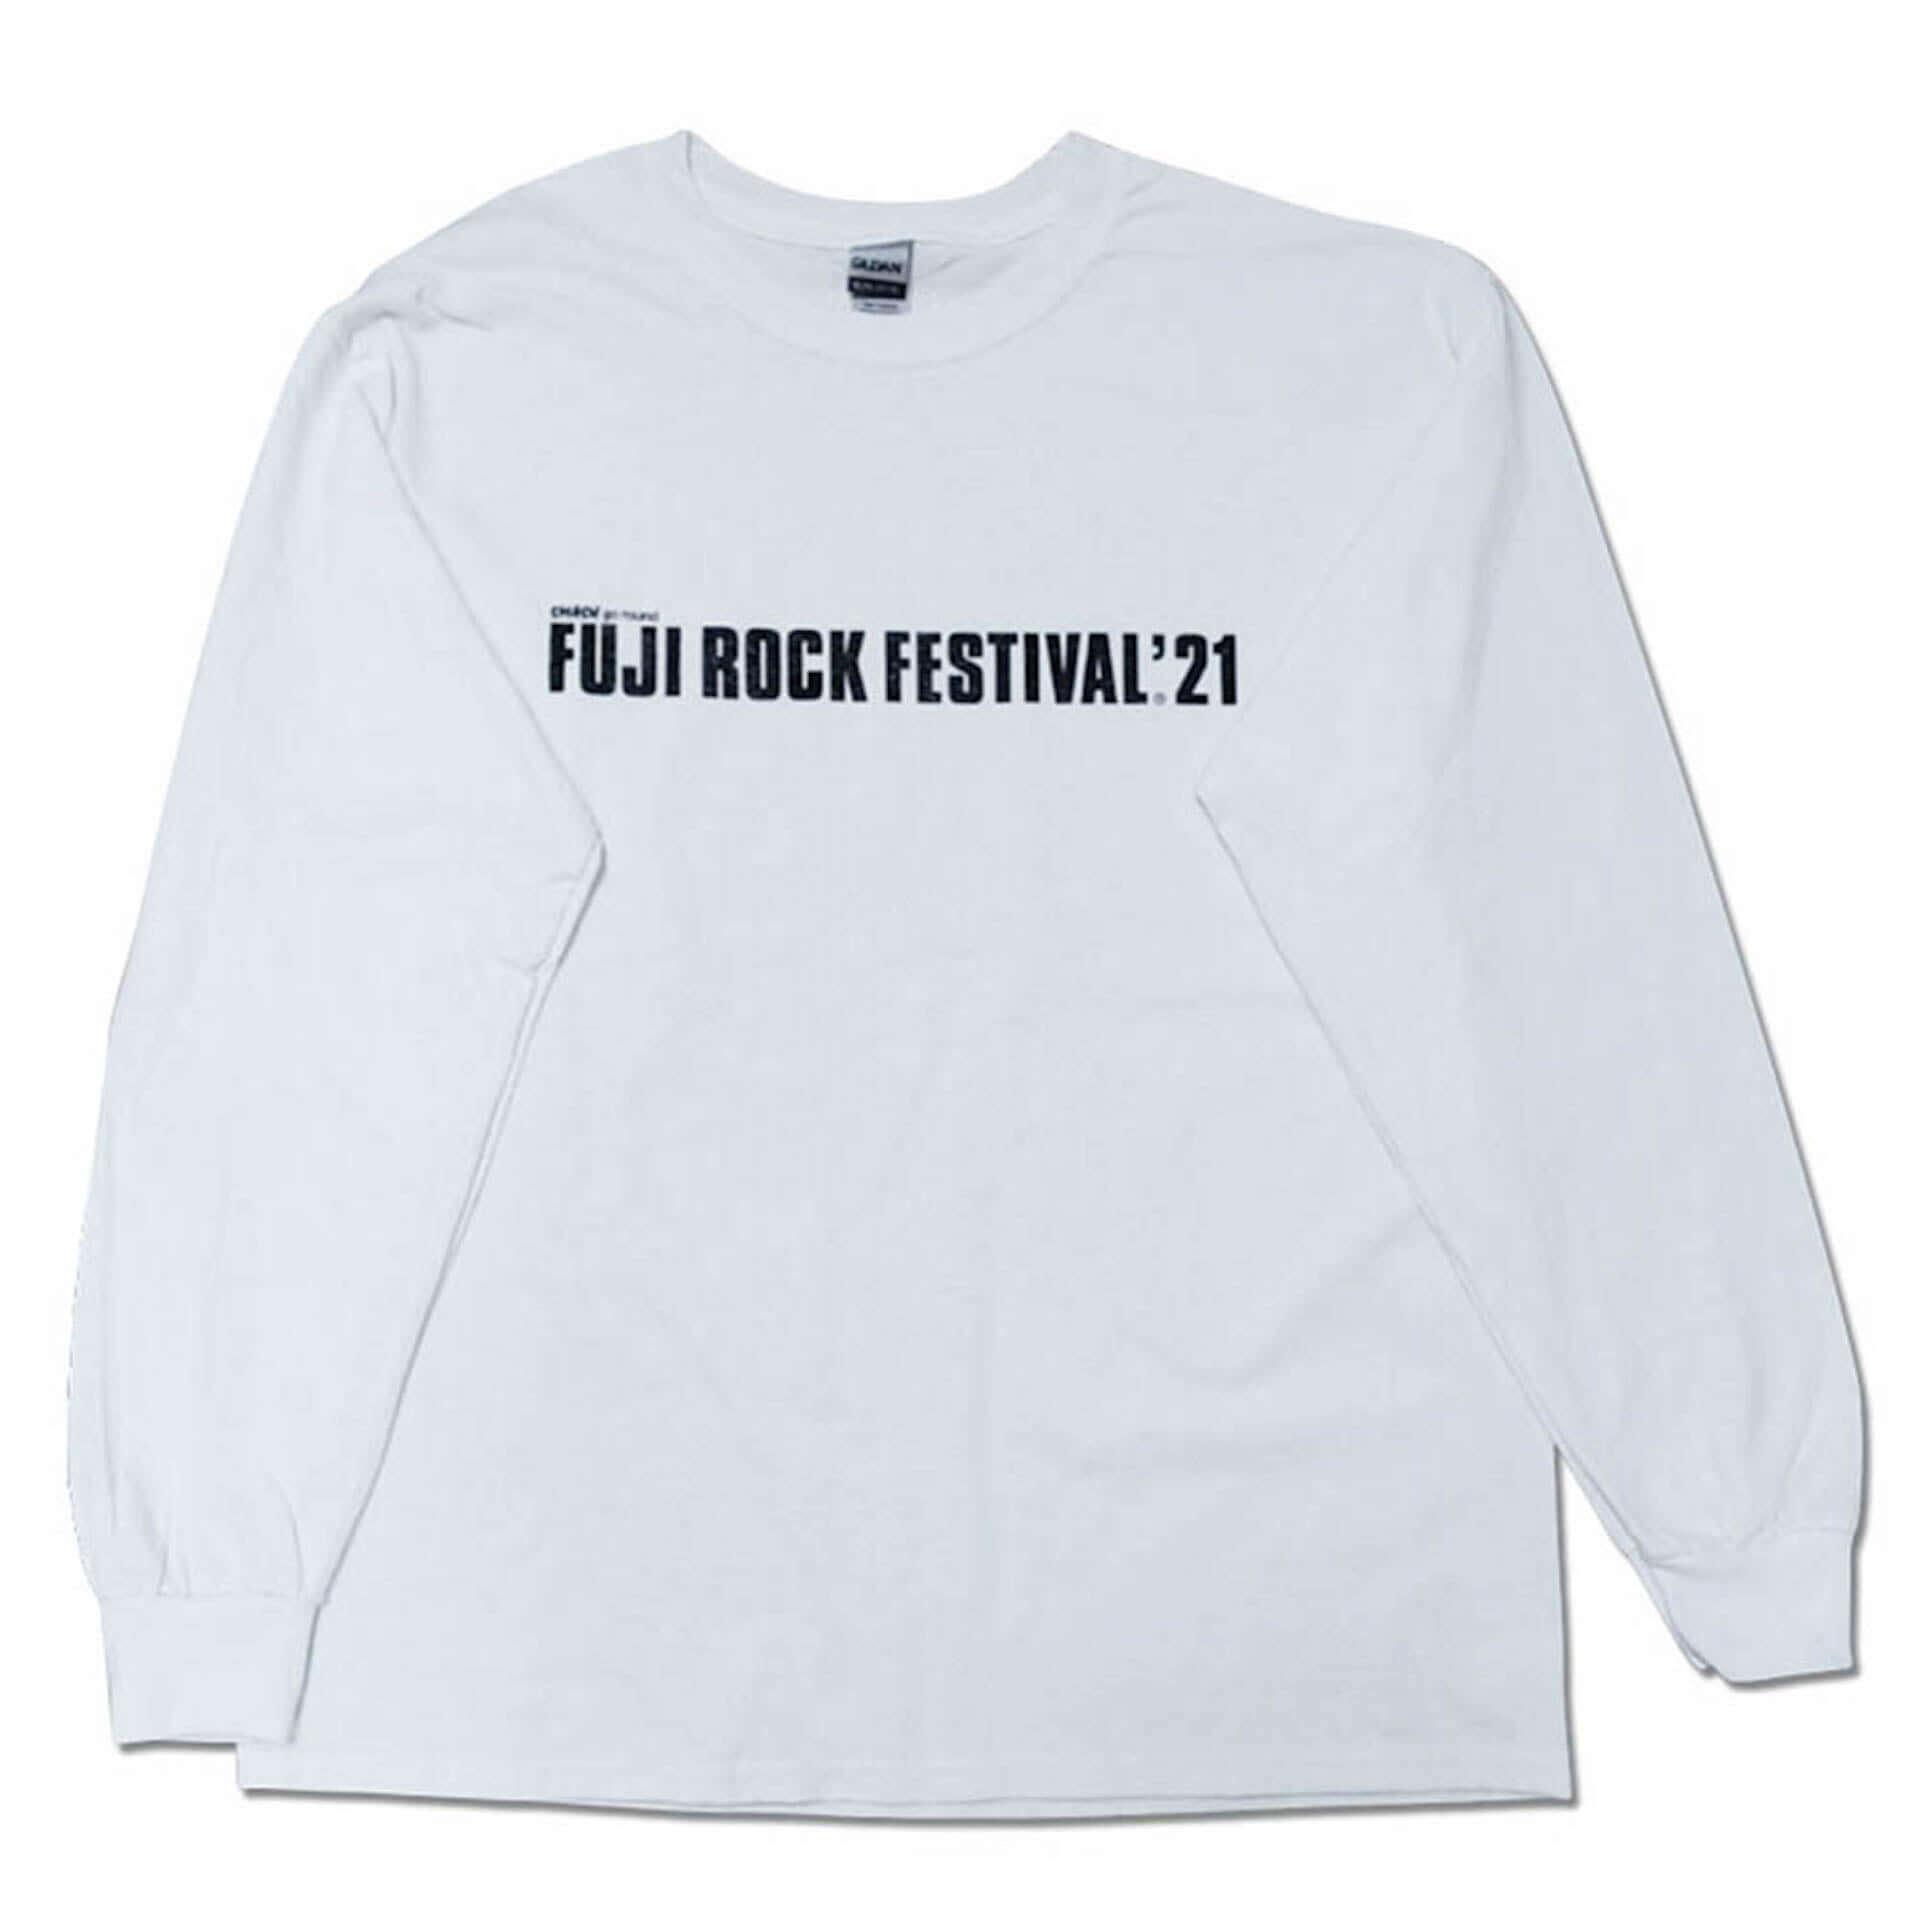 <FUJI ROCK FESTIVAL>公式グッズの新作が登場!大晦日イベント<KEEP ON FUJI ROCKIN' II>のチケットも明日発売 musicf201211_frf_18-1920x1920